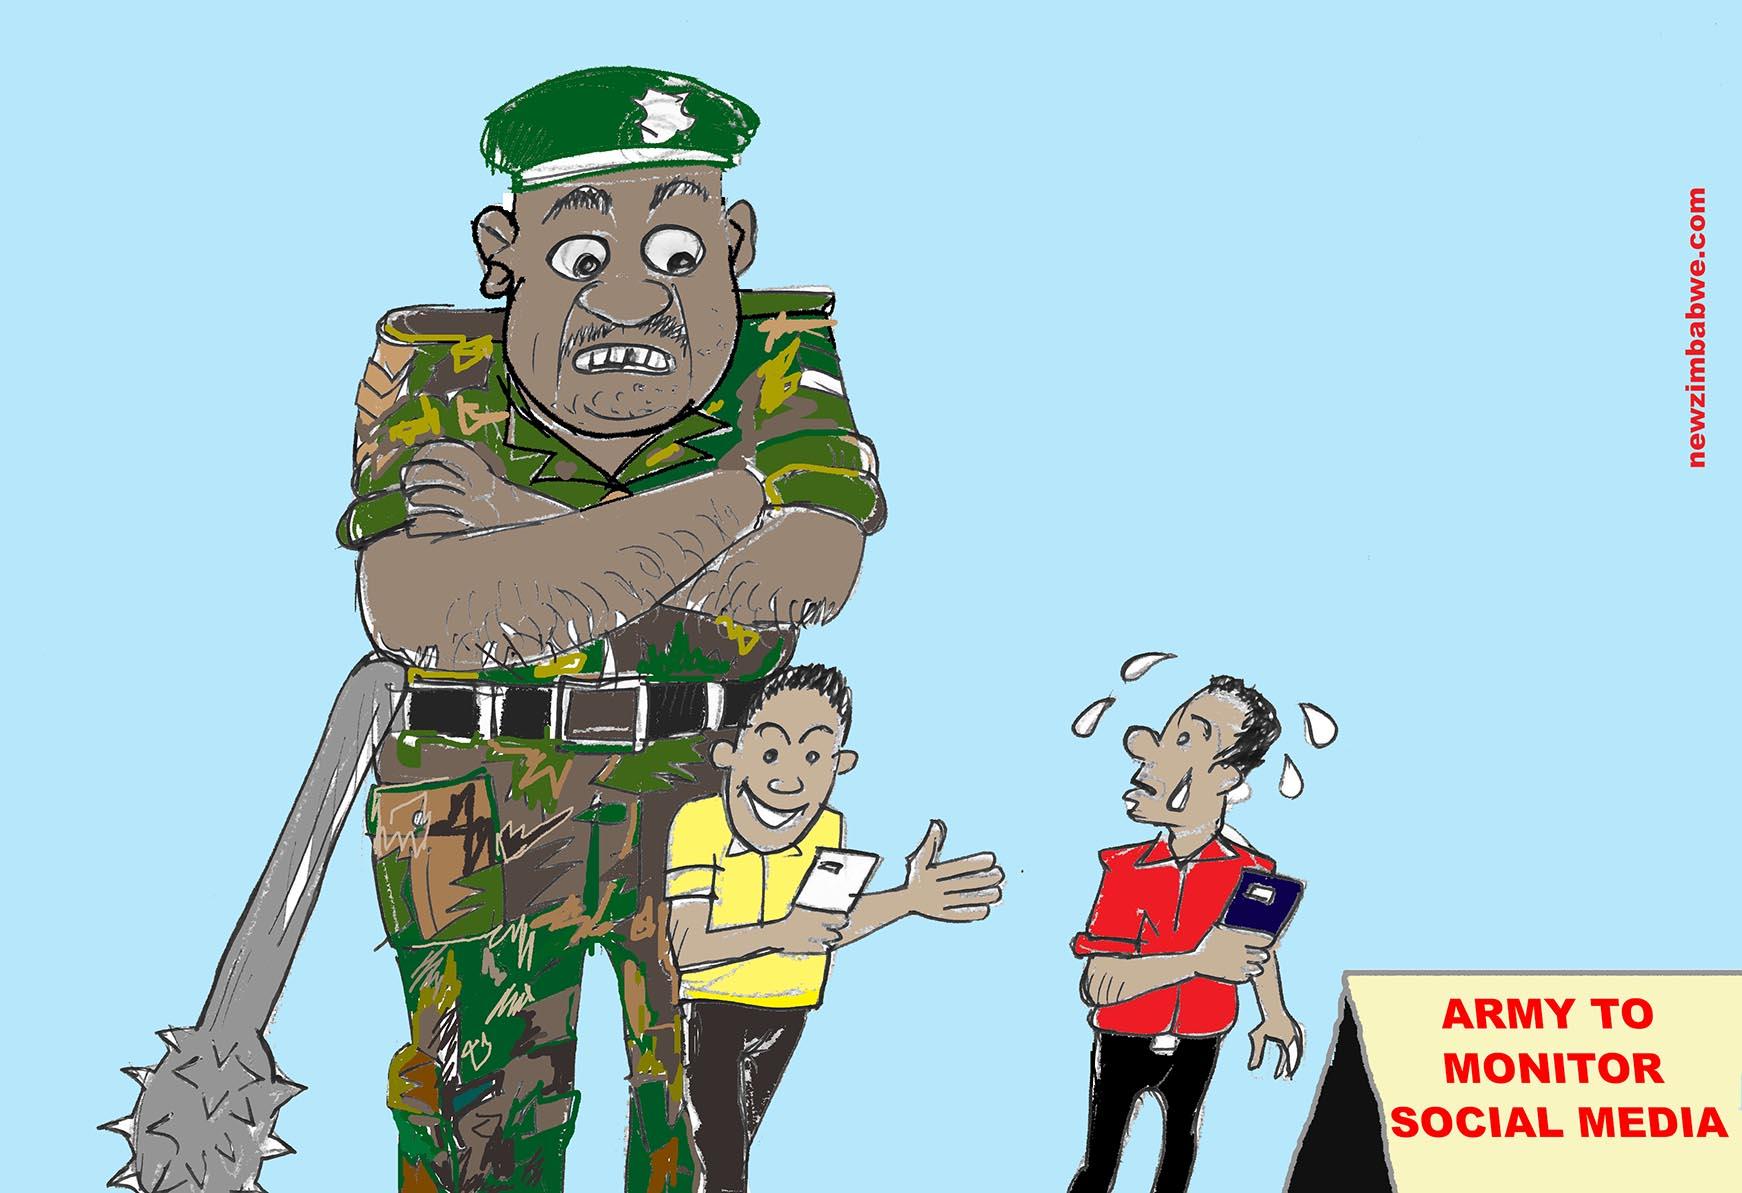 Army to monitor social media